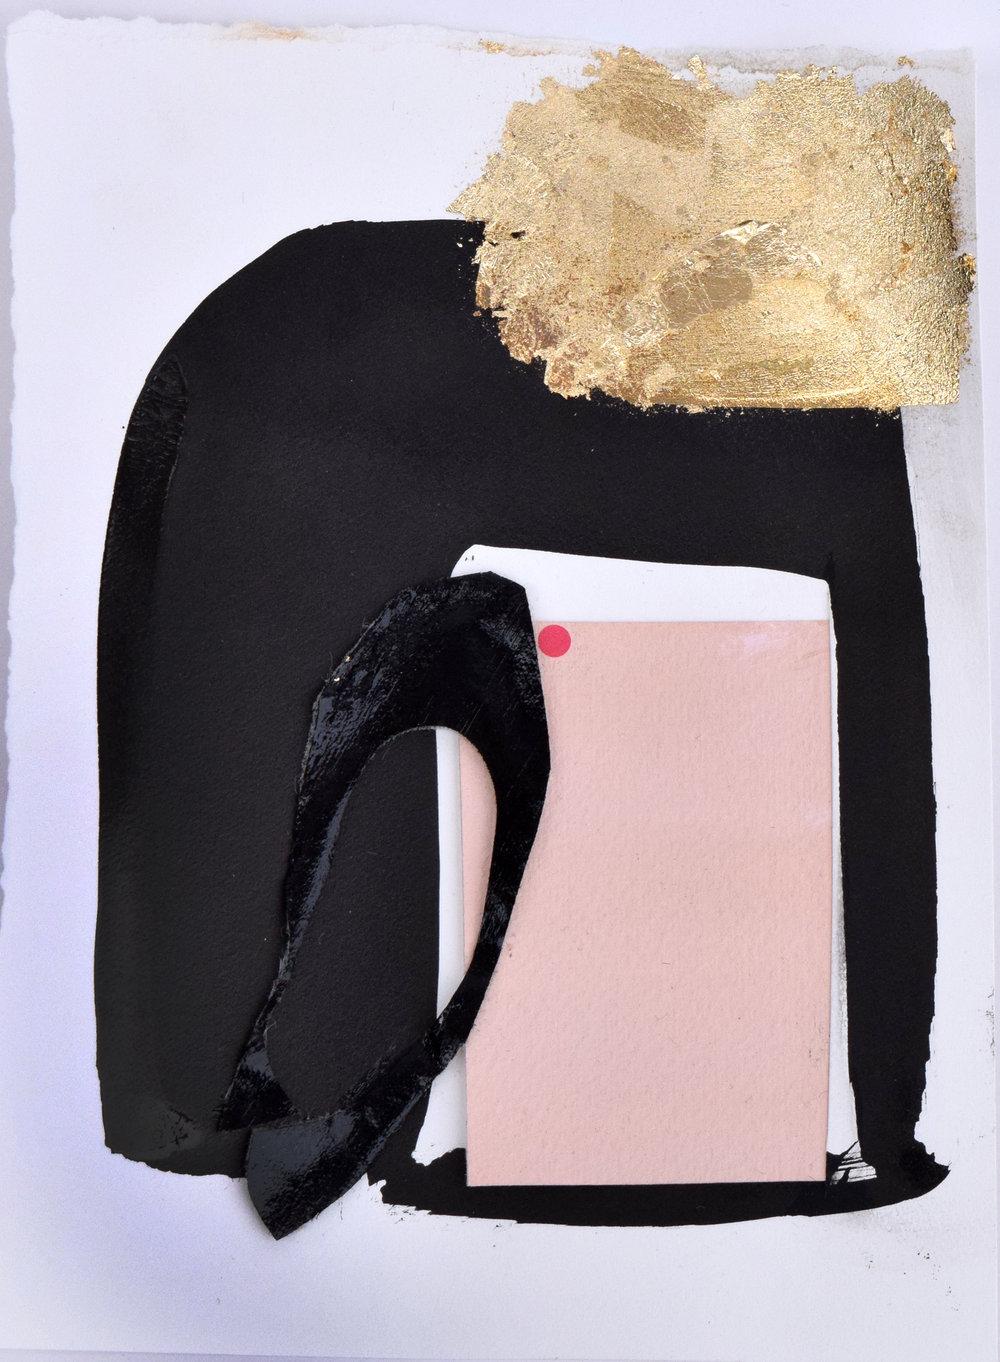 Peel apart